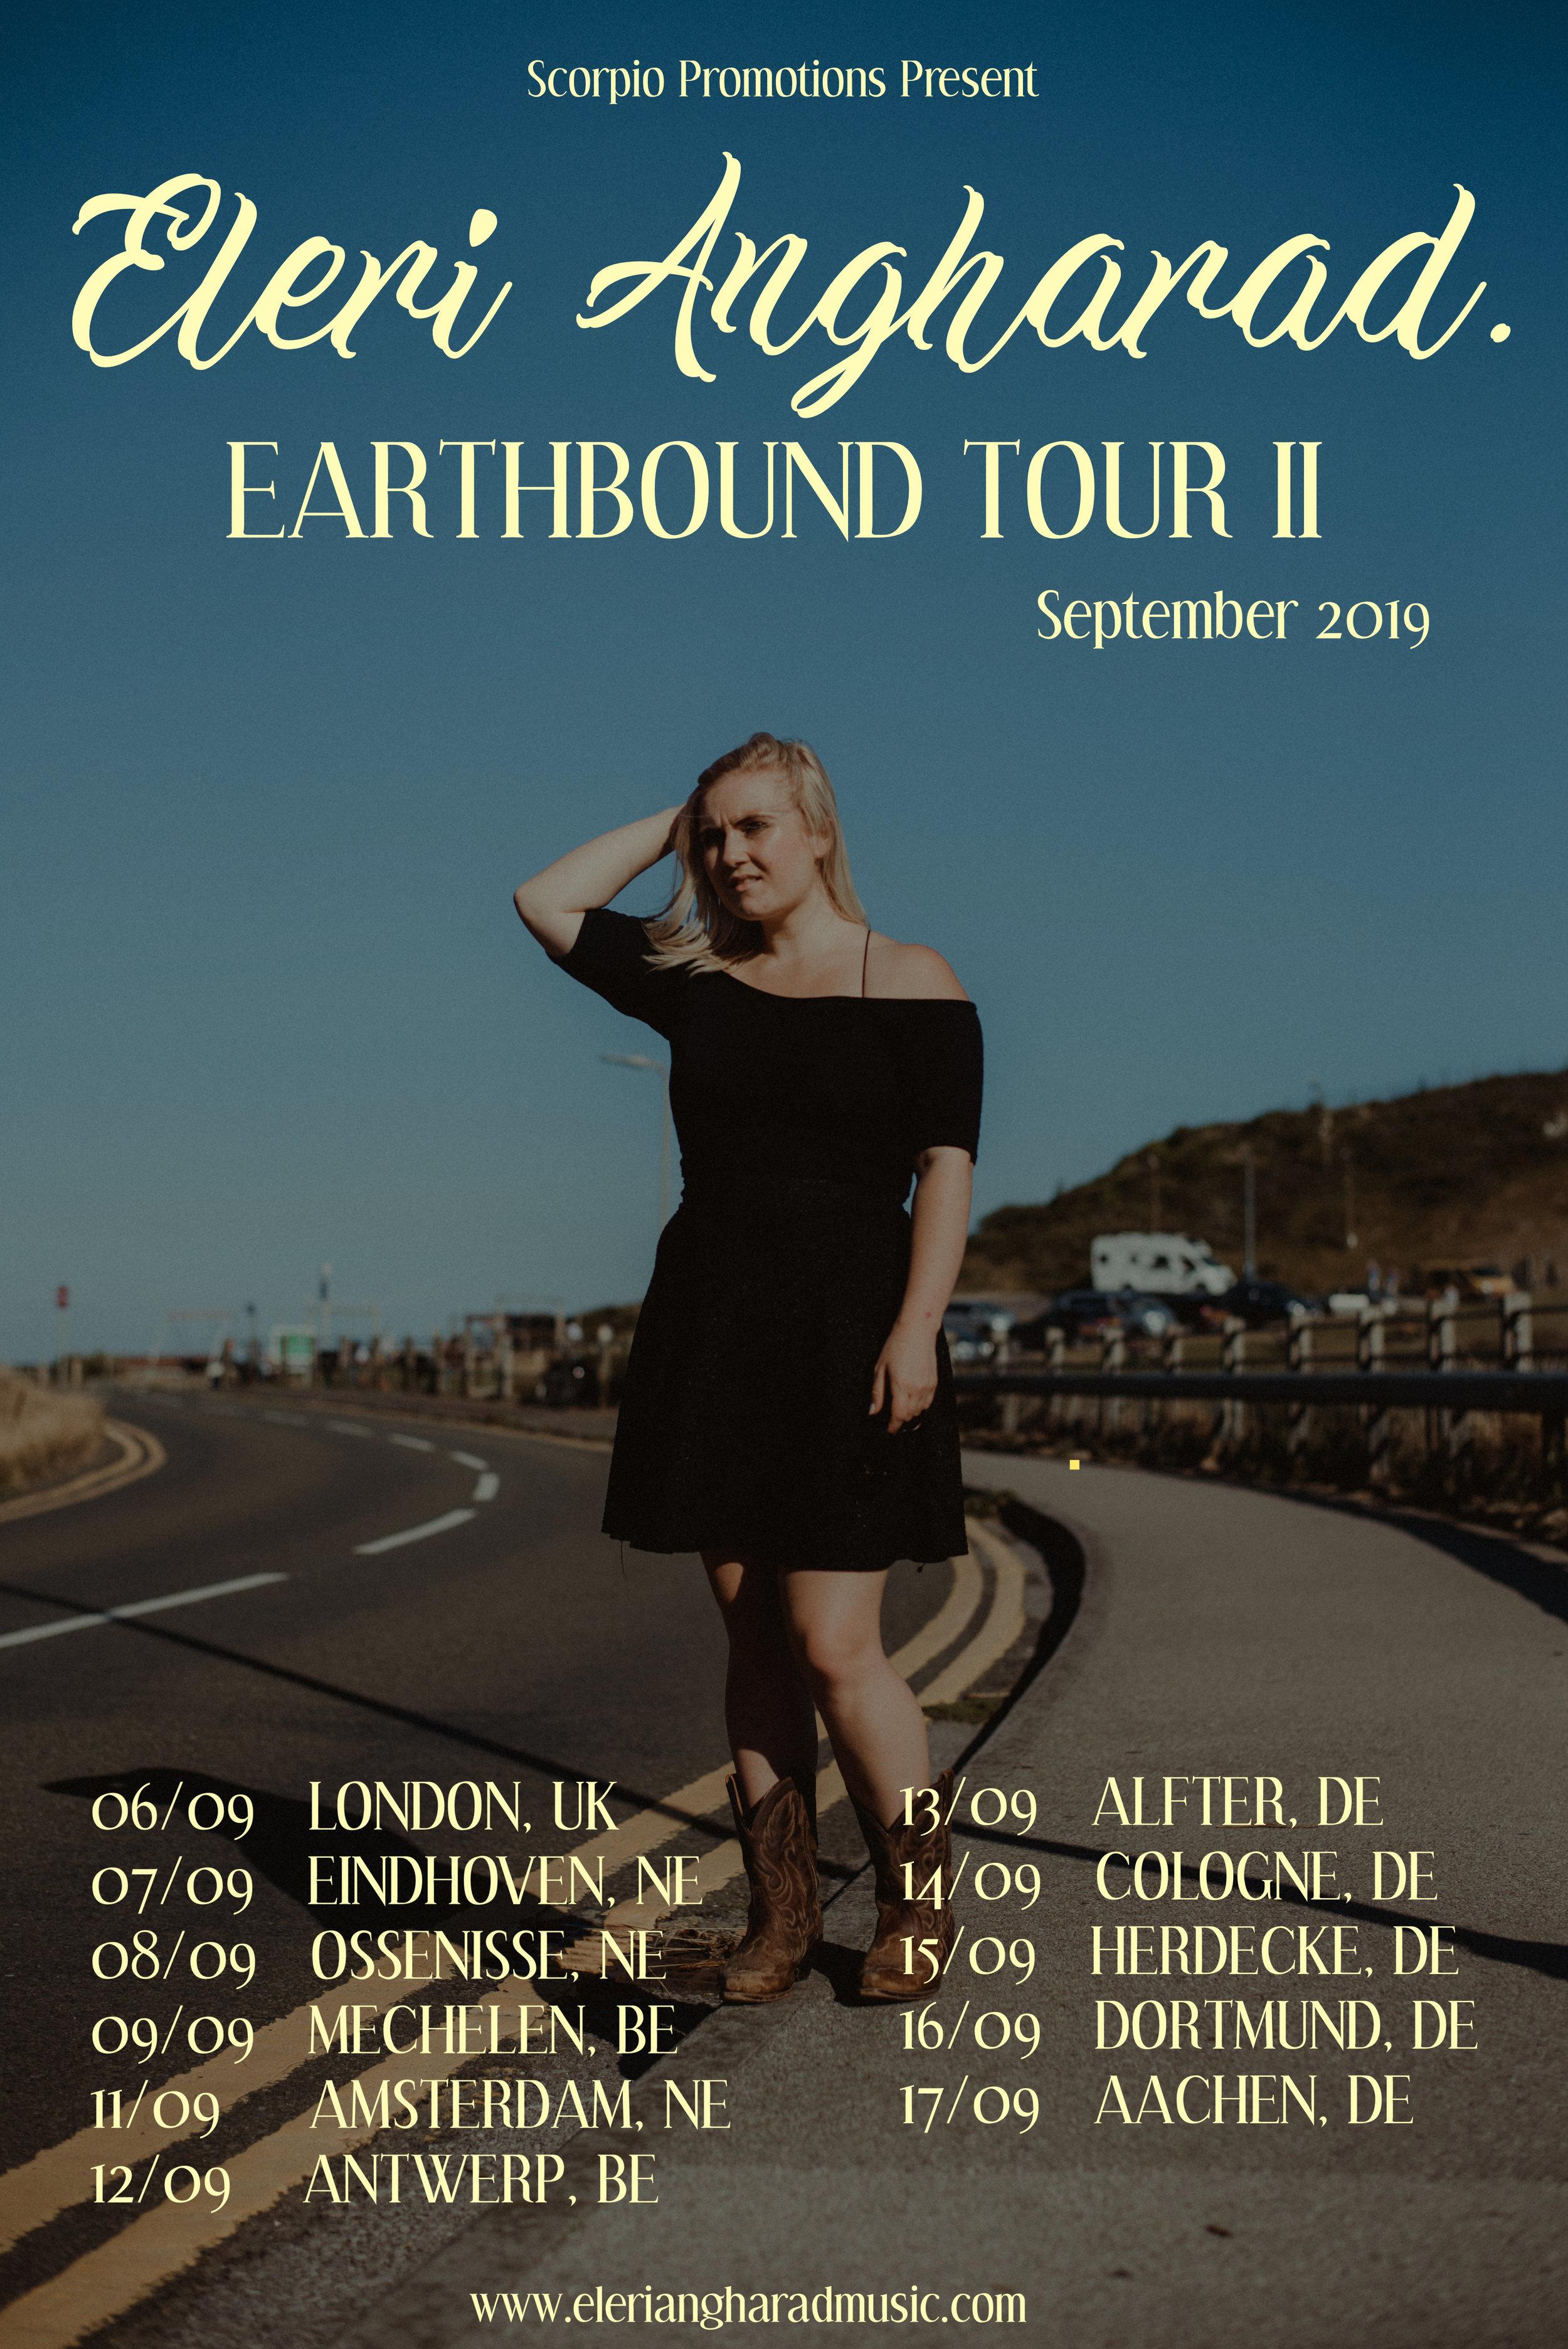 europe tour.jpg